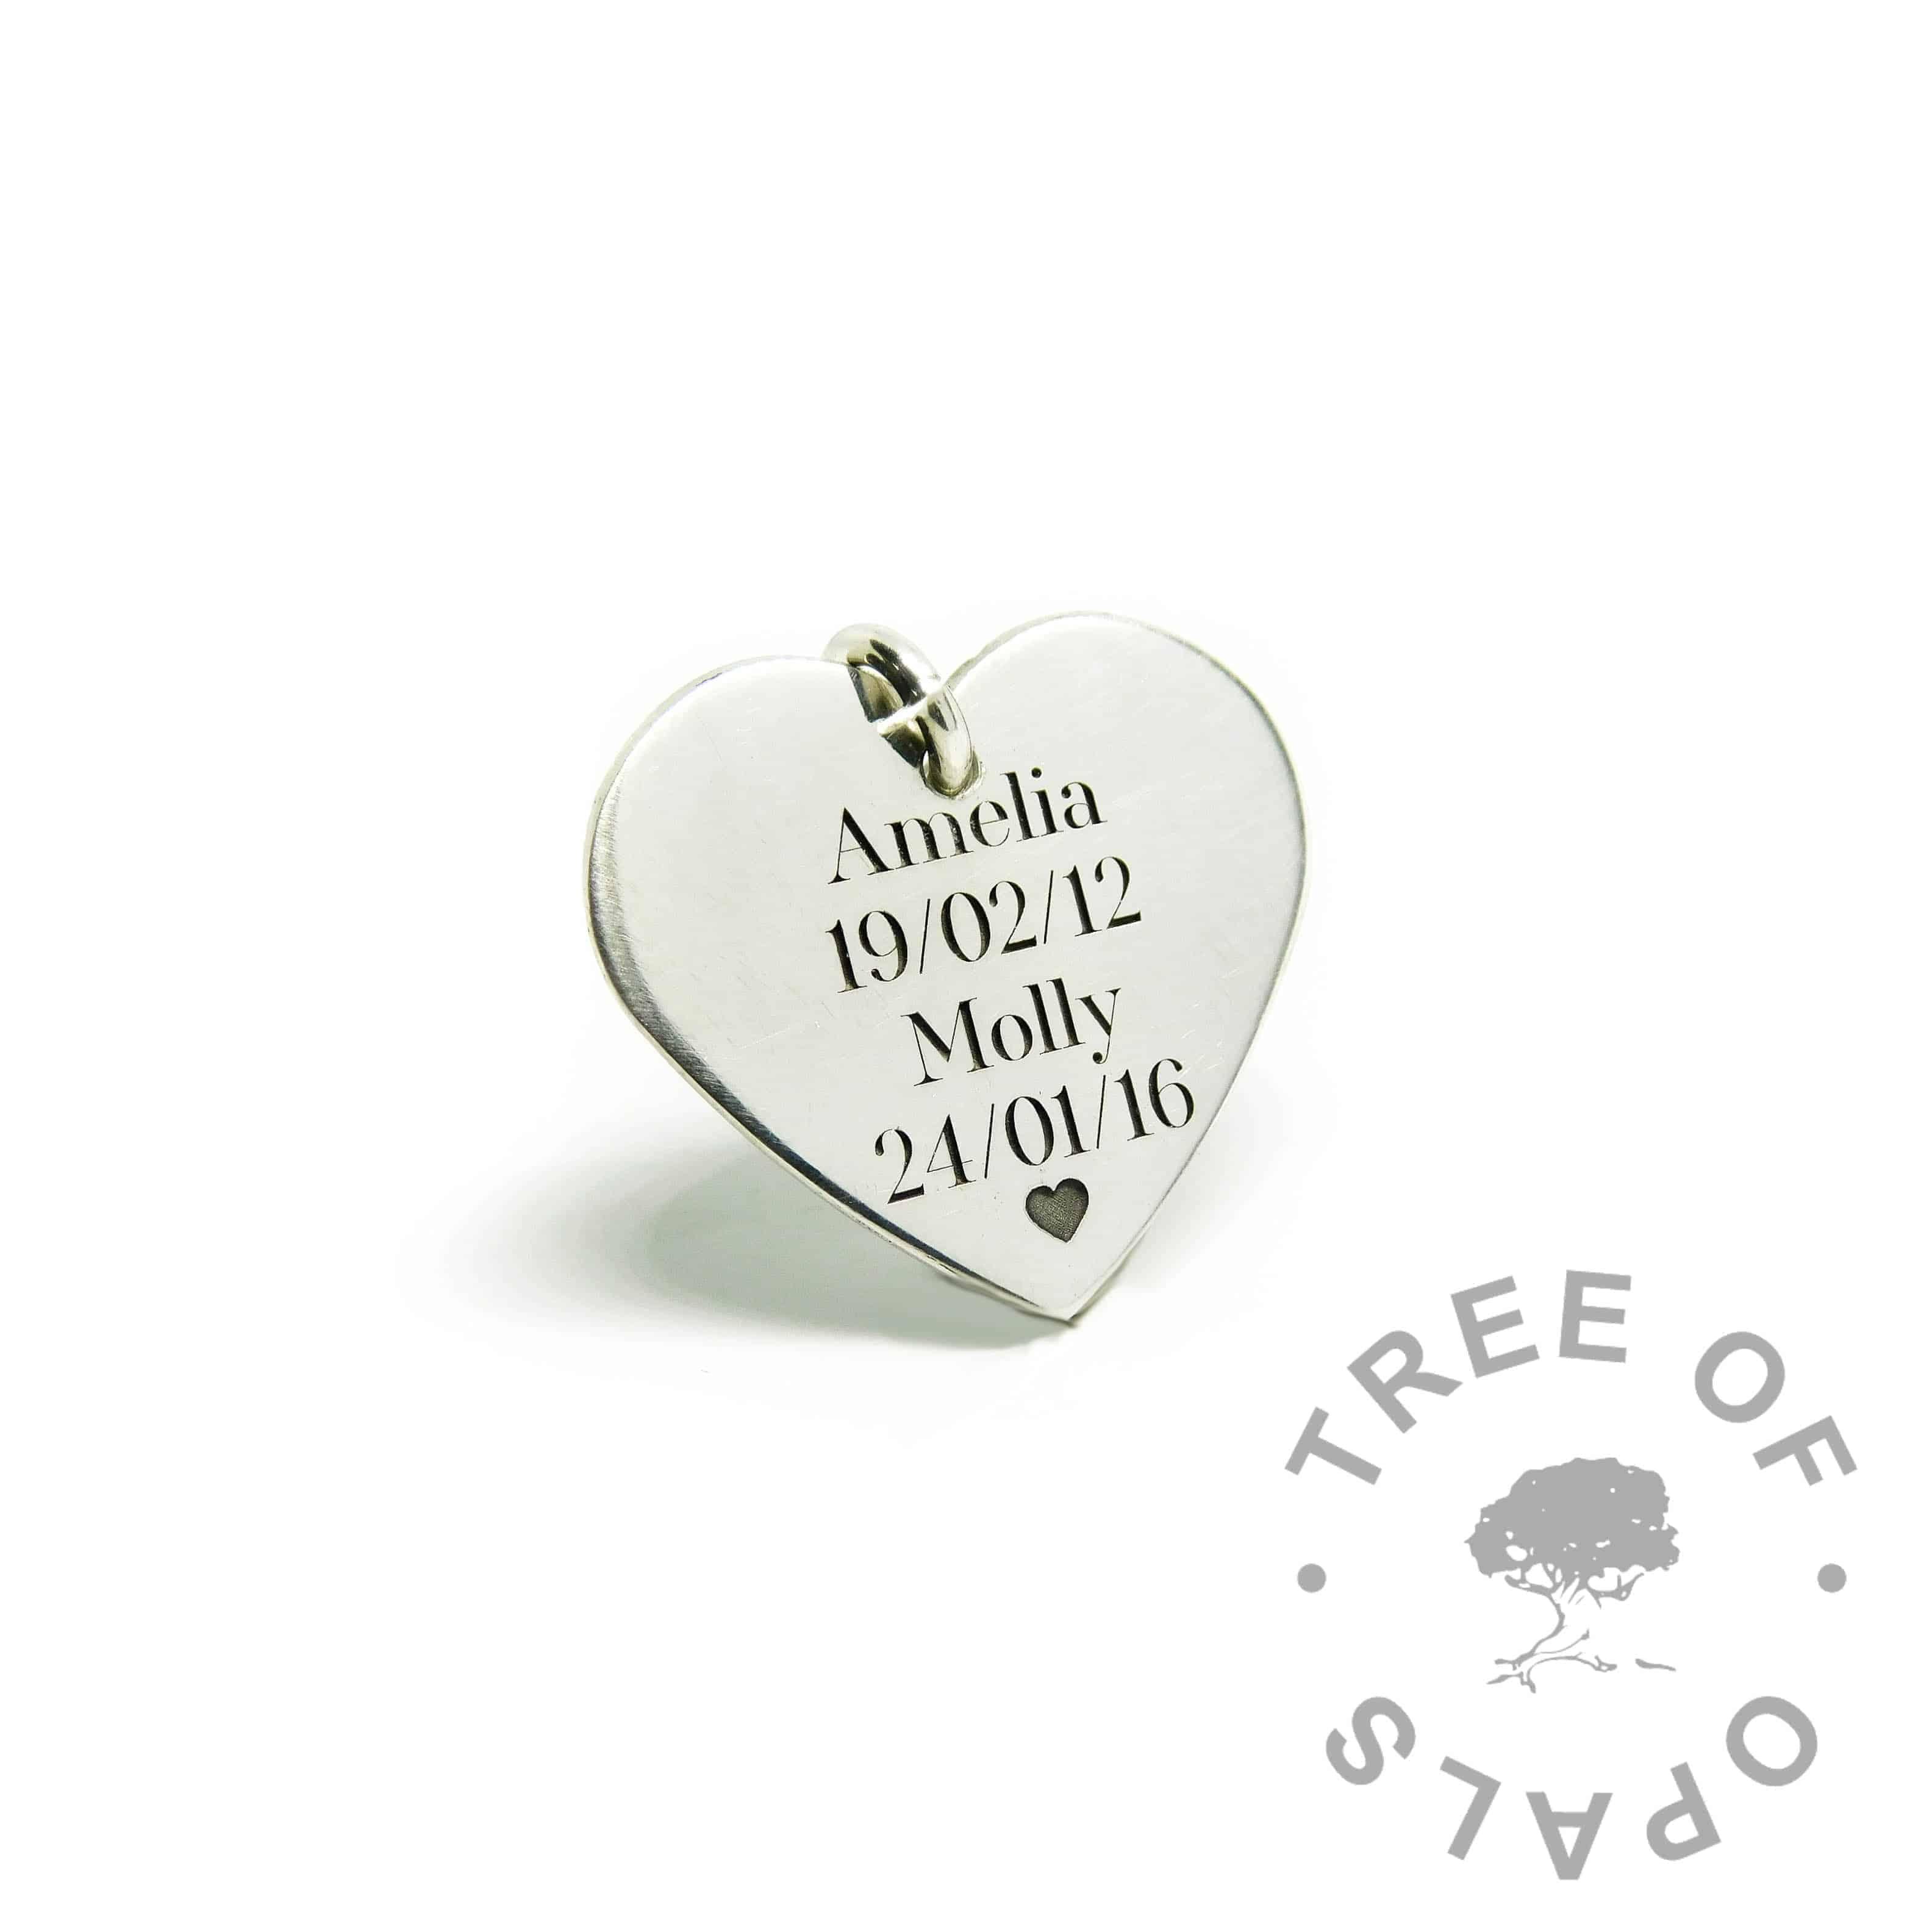 engraved medium heart pendant, Silver South Serif font with heart emoji